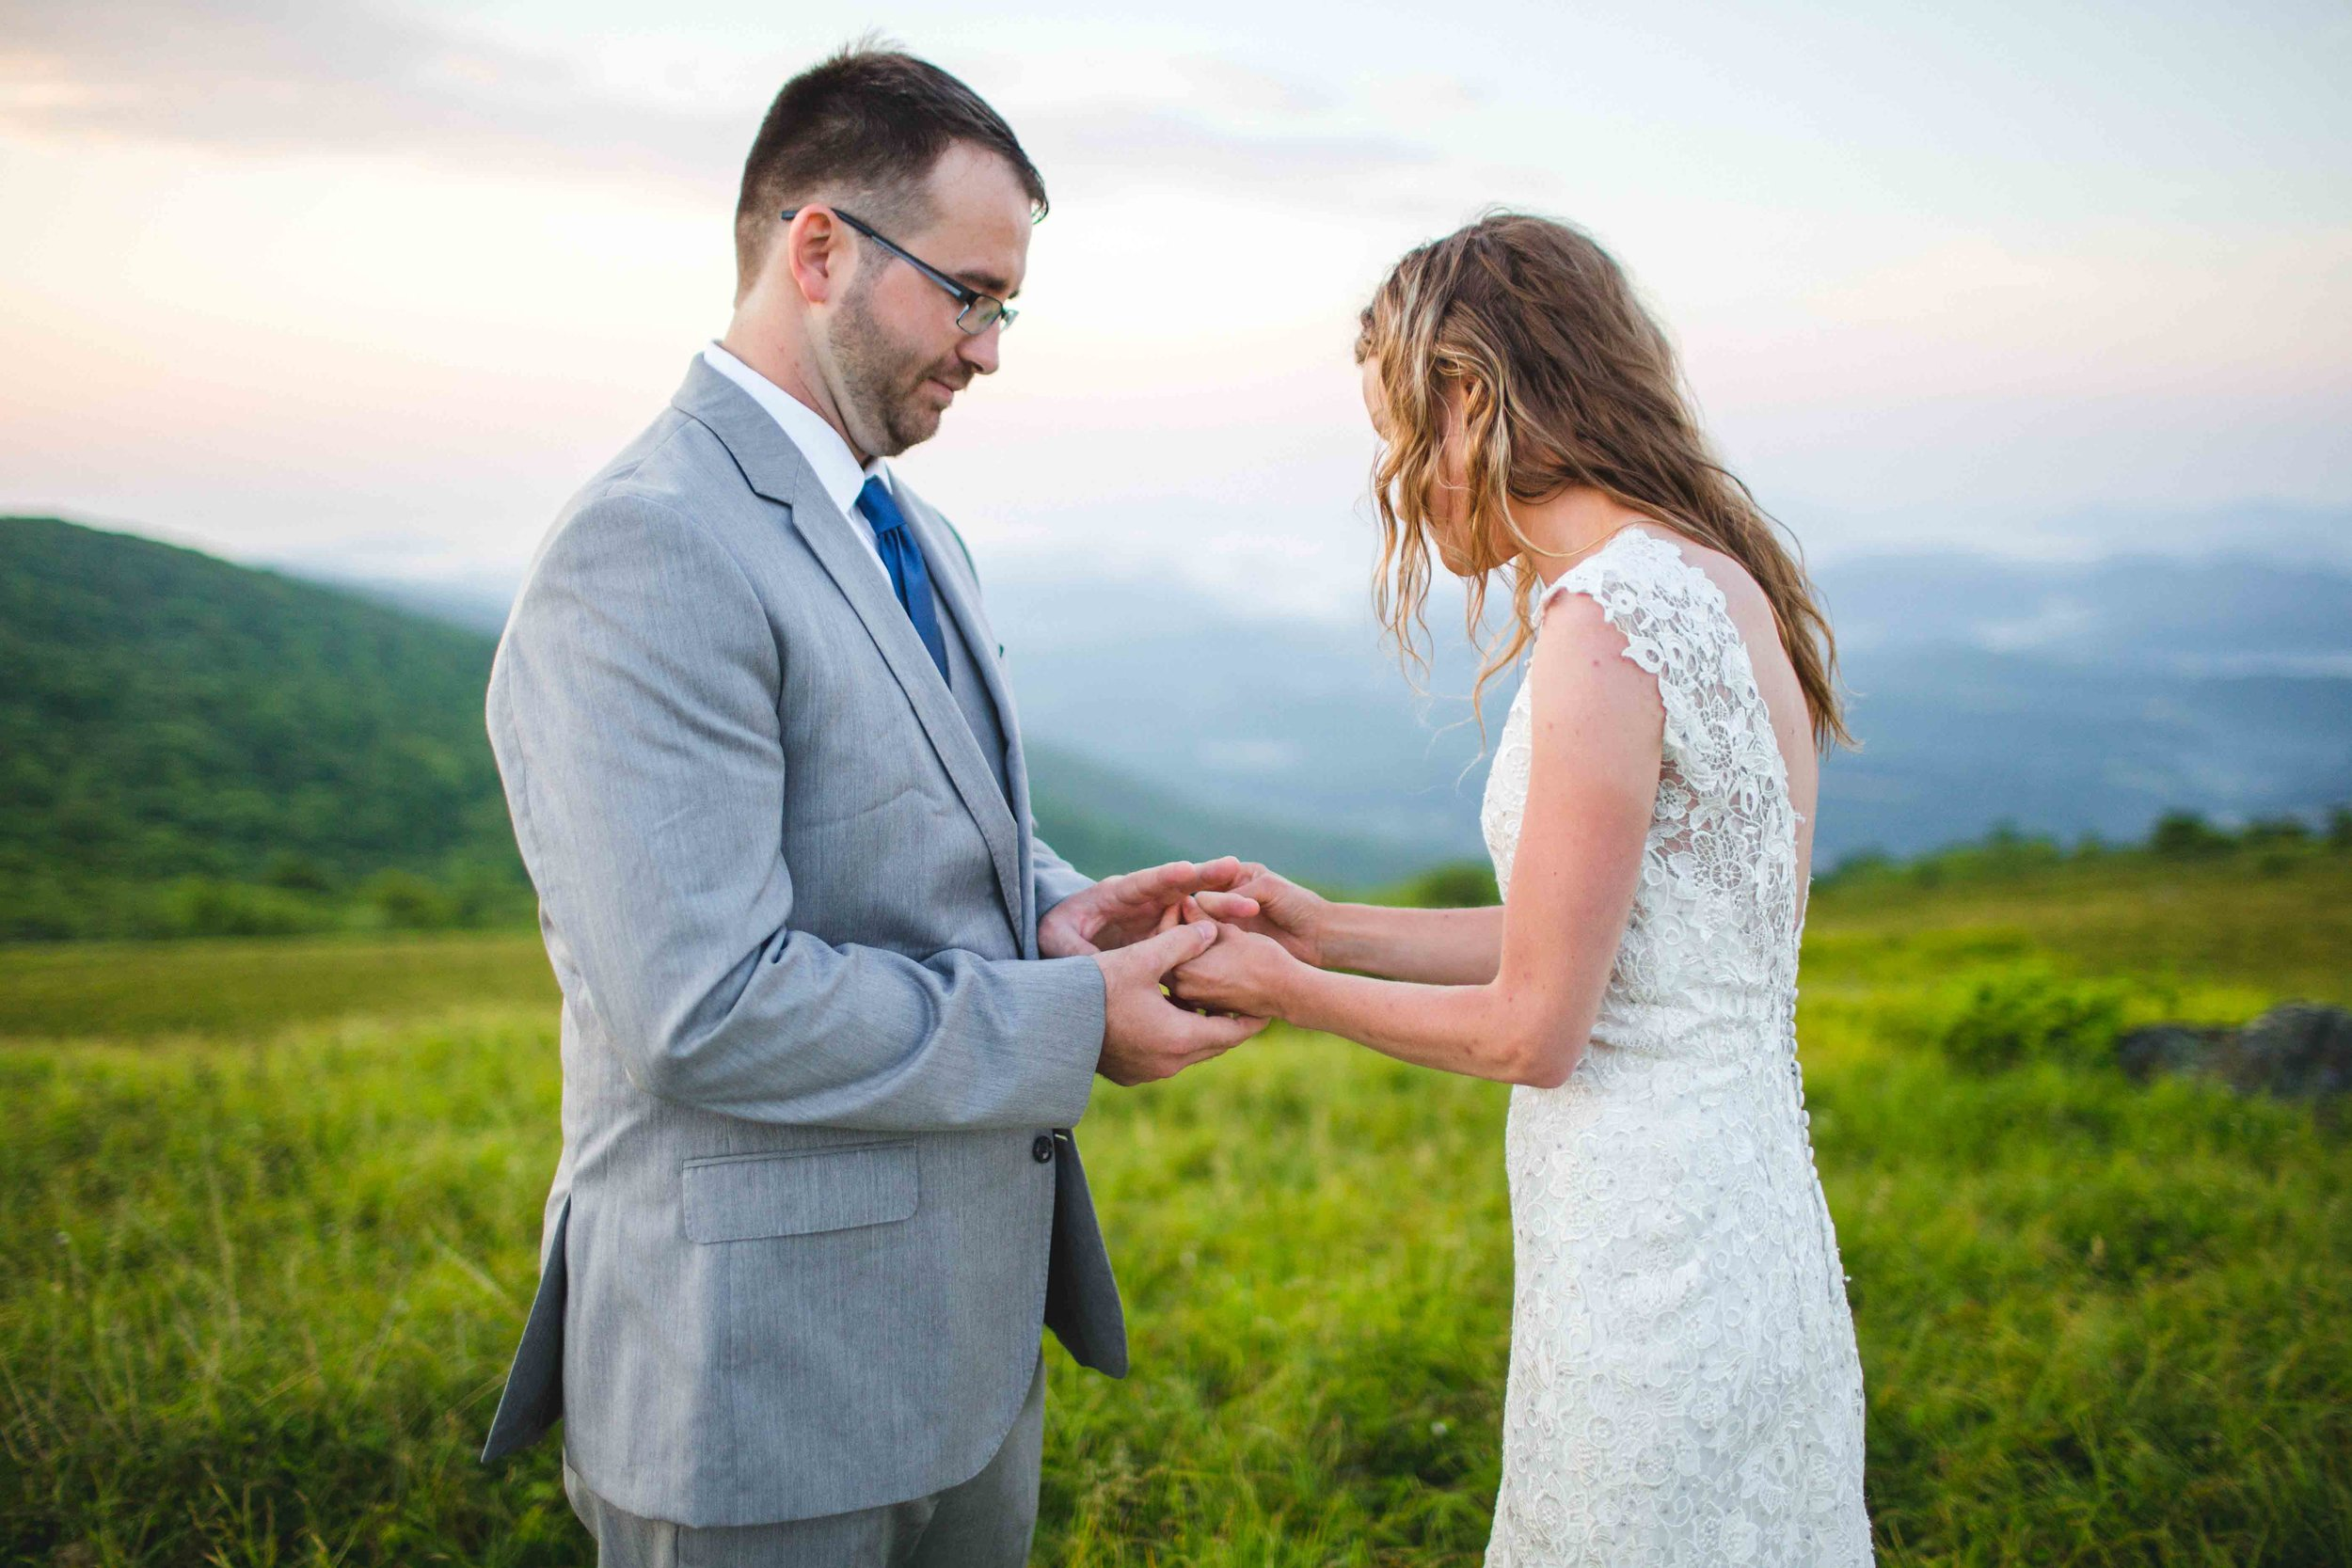 north-carolina-elopement-photographer-34.jpg